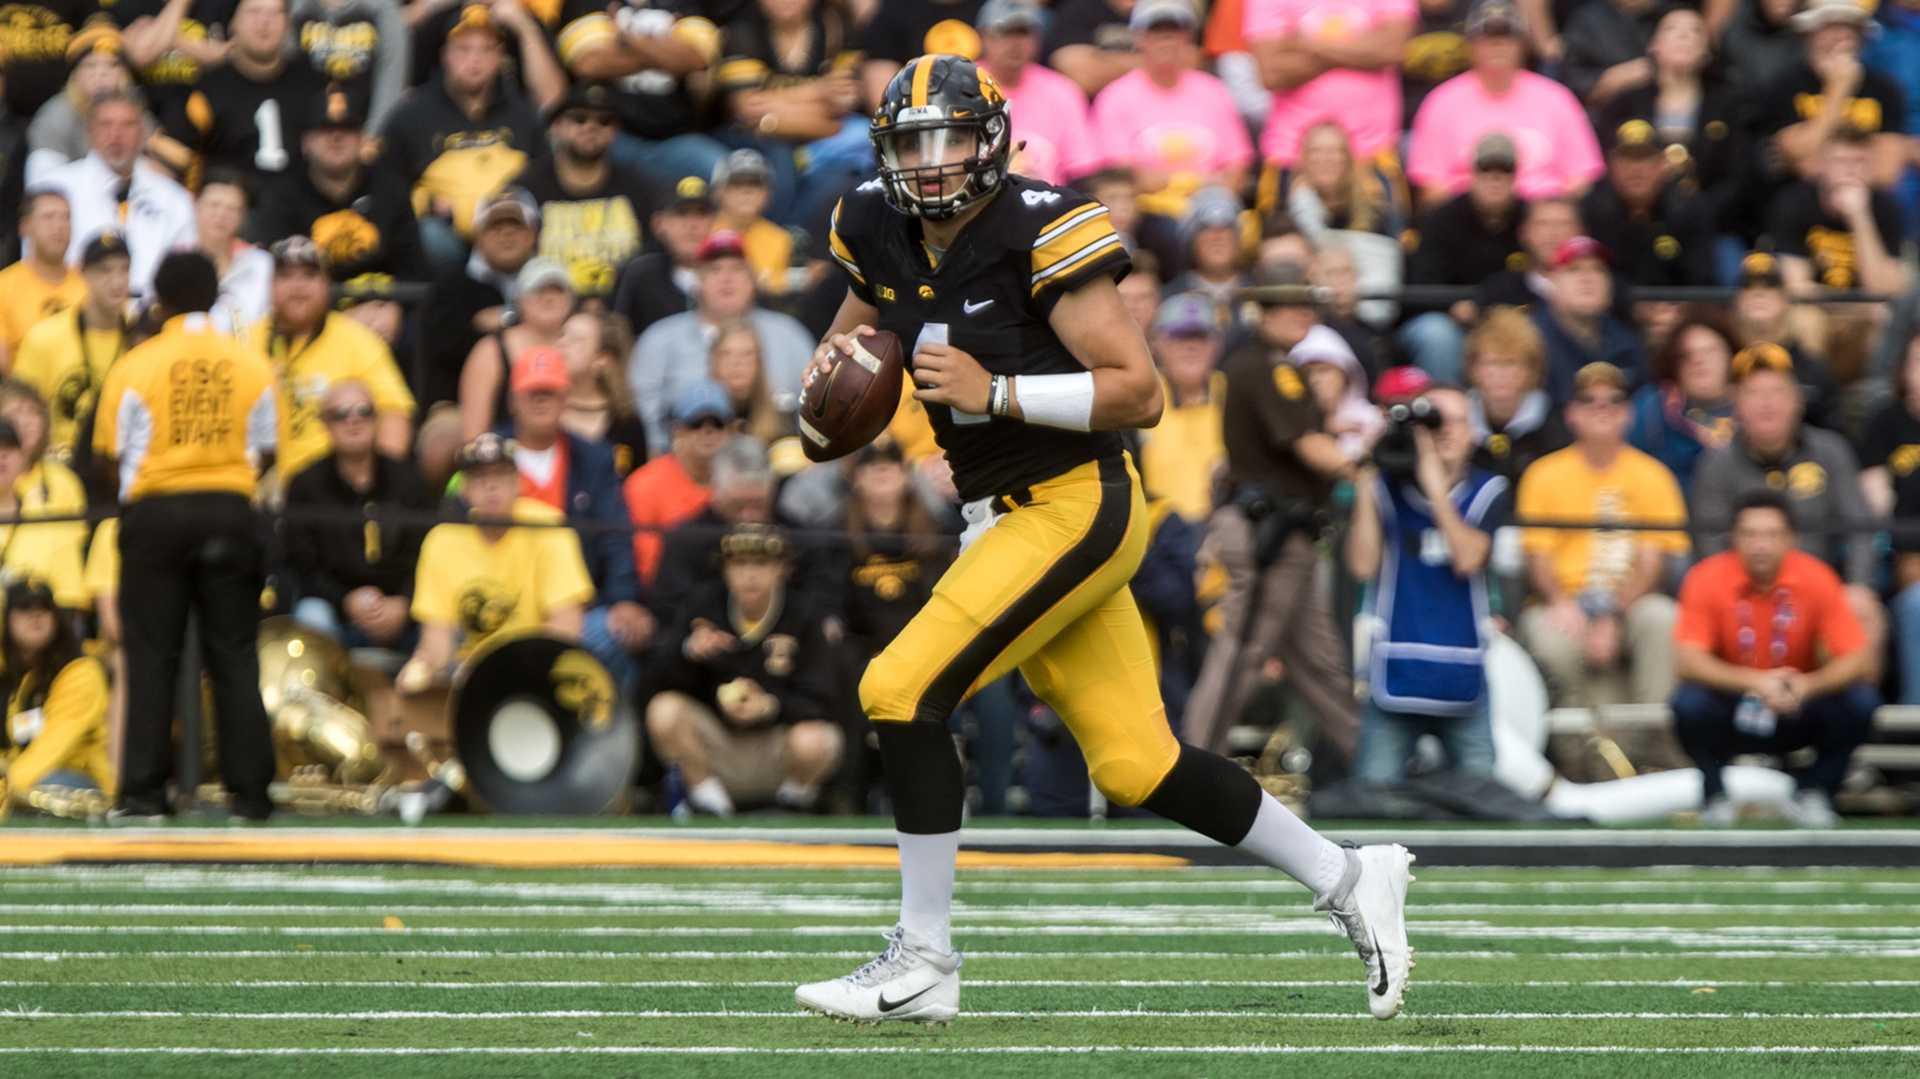 Iowa quarterback Nate Stanley drops back to pass during the Iowa/Illinois football game on Saturday, Oct. 7, 2017. Iowa won the game 45-16. (David Harmantas/The Daily Iowan)